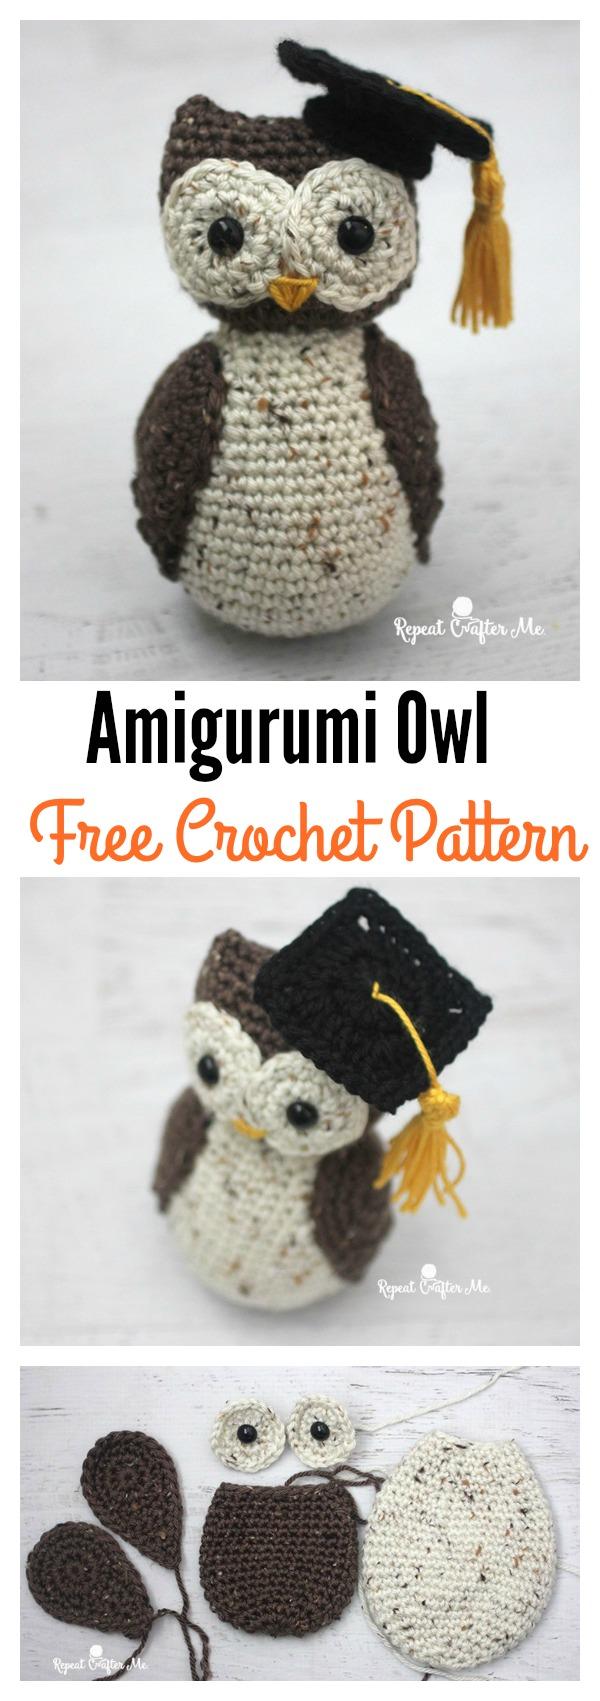 Free Crochet Pattern Amigurumi Graduation Owl